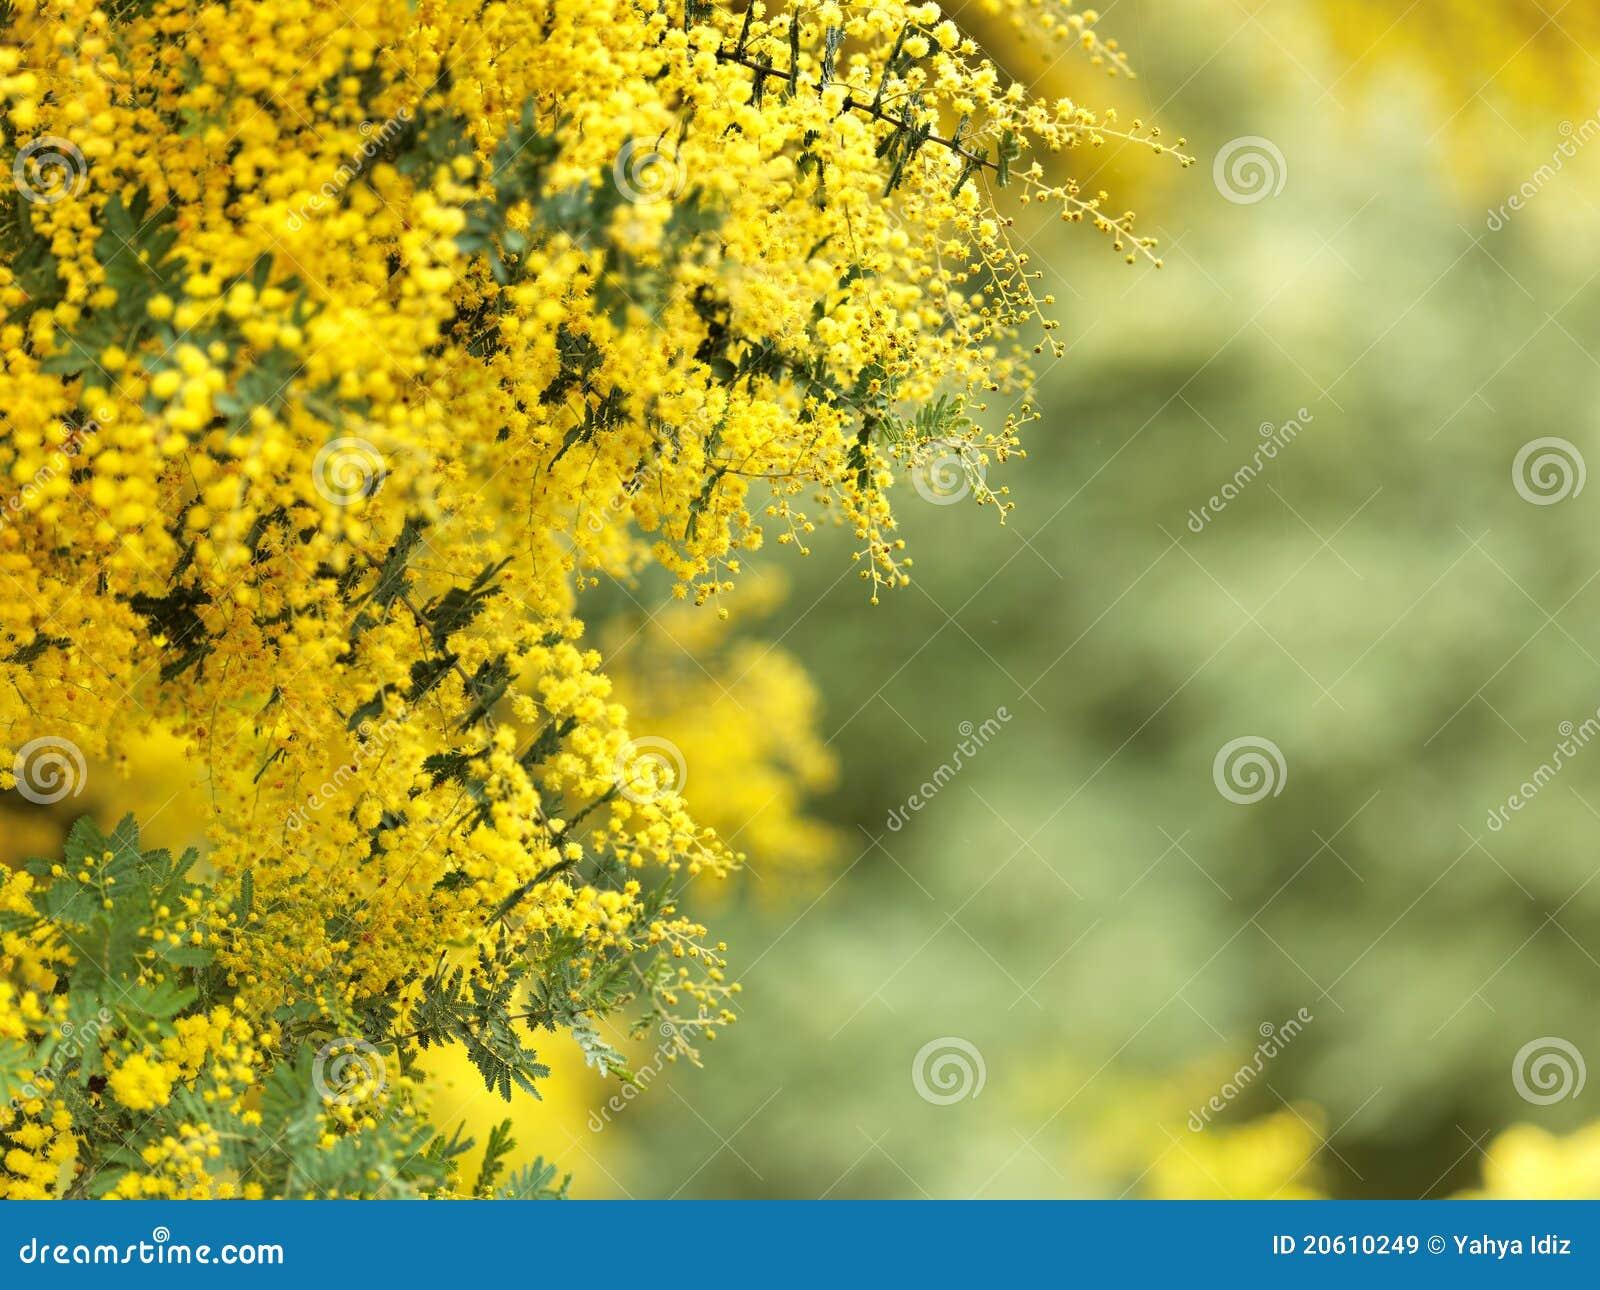 The native australian flower stock image image of golden the native australian flower mightylinksfo